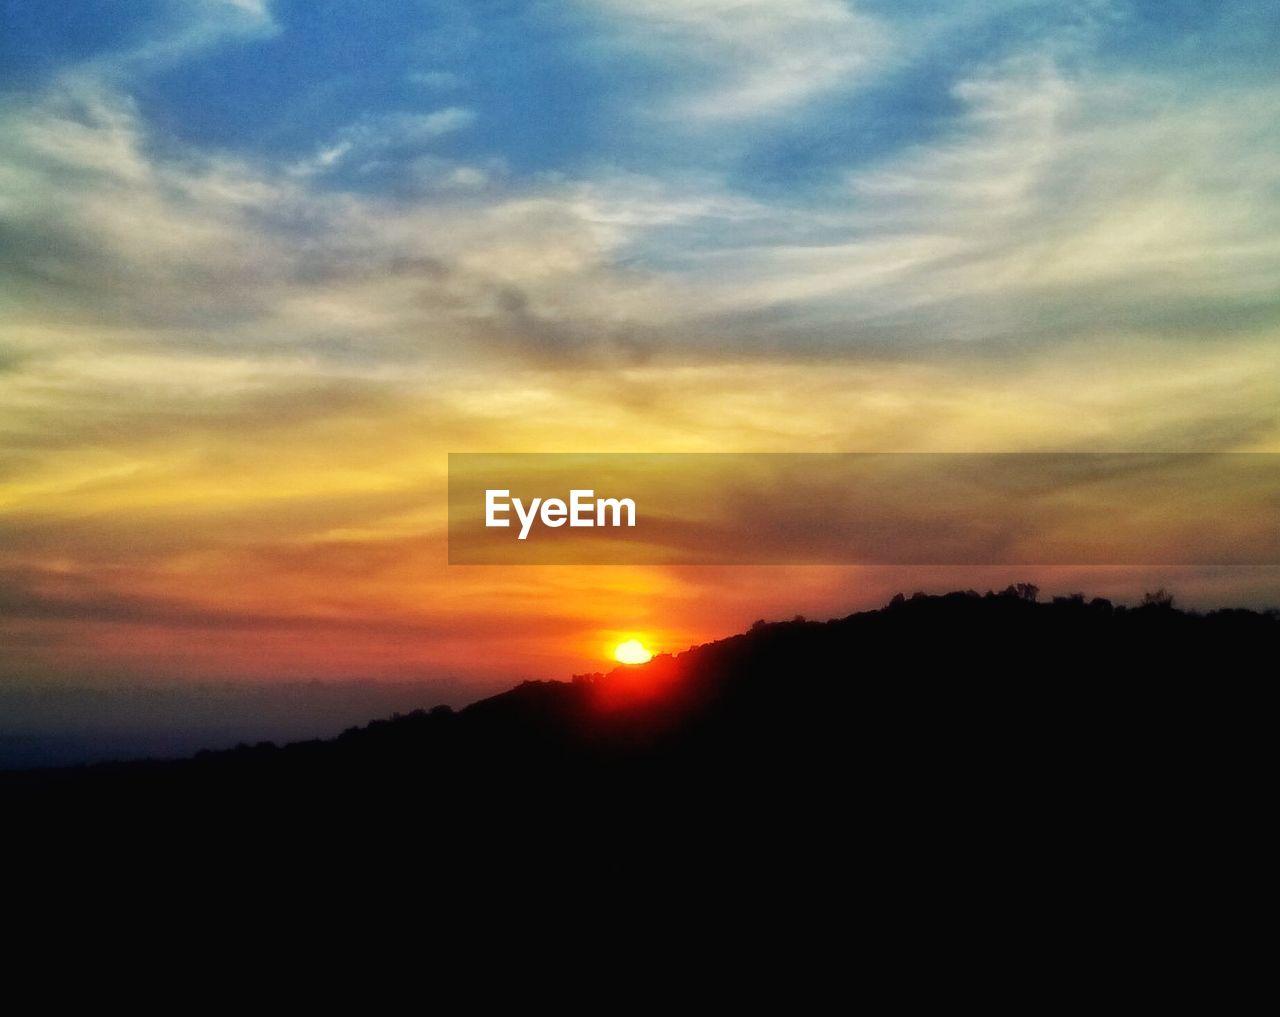 sunset, silhouette, nature, sun, sky, beauty in nature, tranquil scene, scenics, landscape, no people, adventure, outdoors